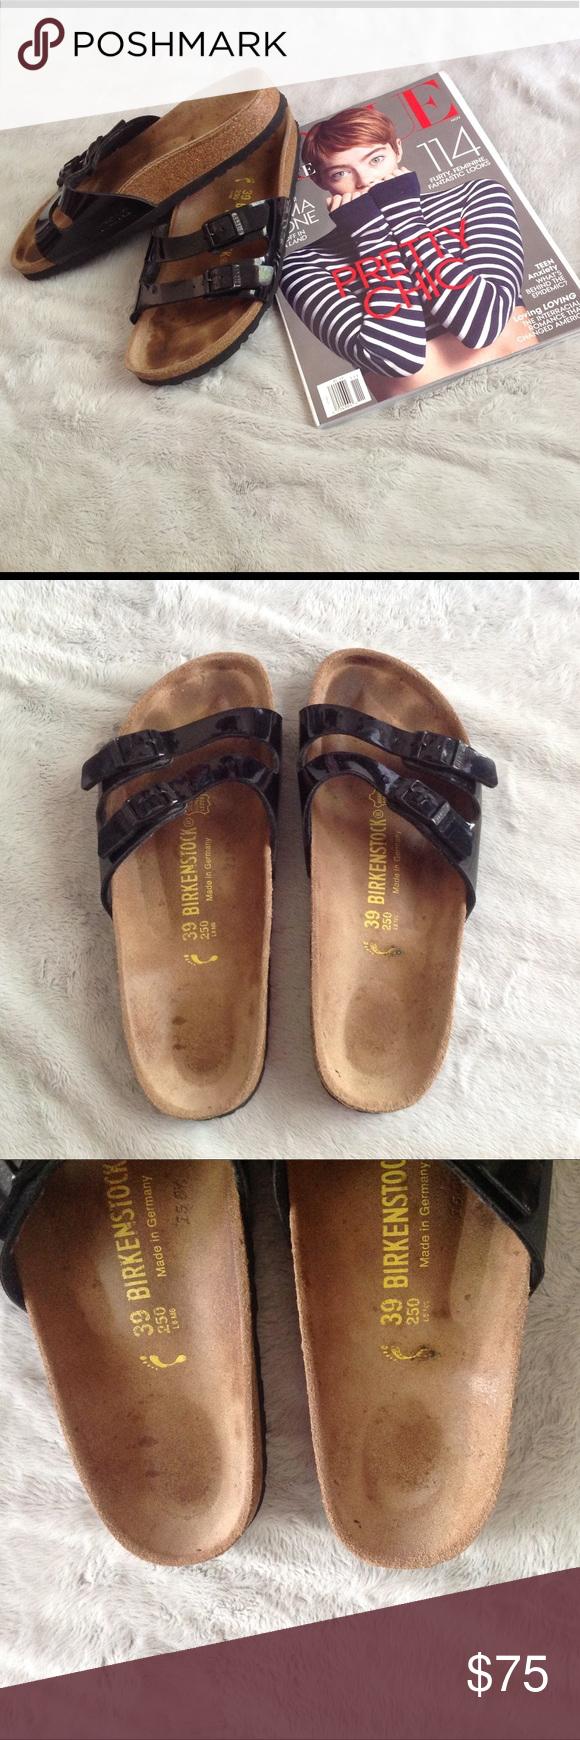 01c9afc8a135 Birkenstock Ibiza Sandals Black Patent Strap